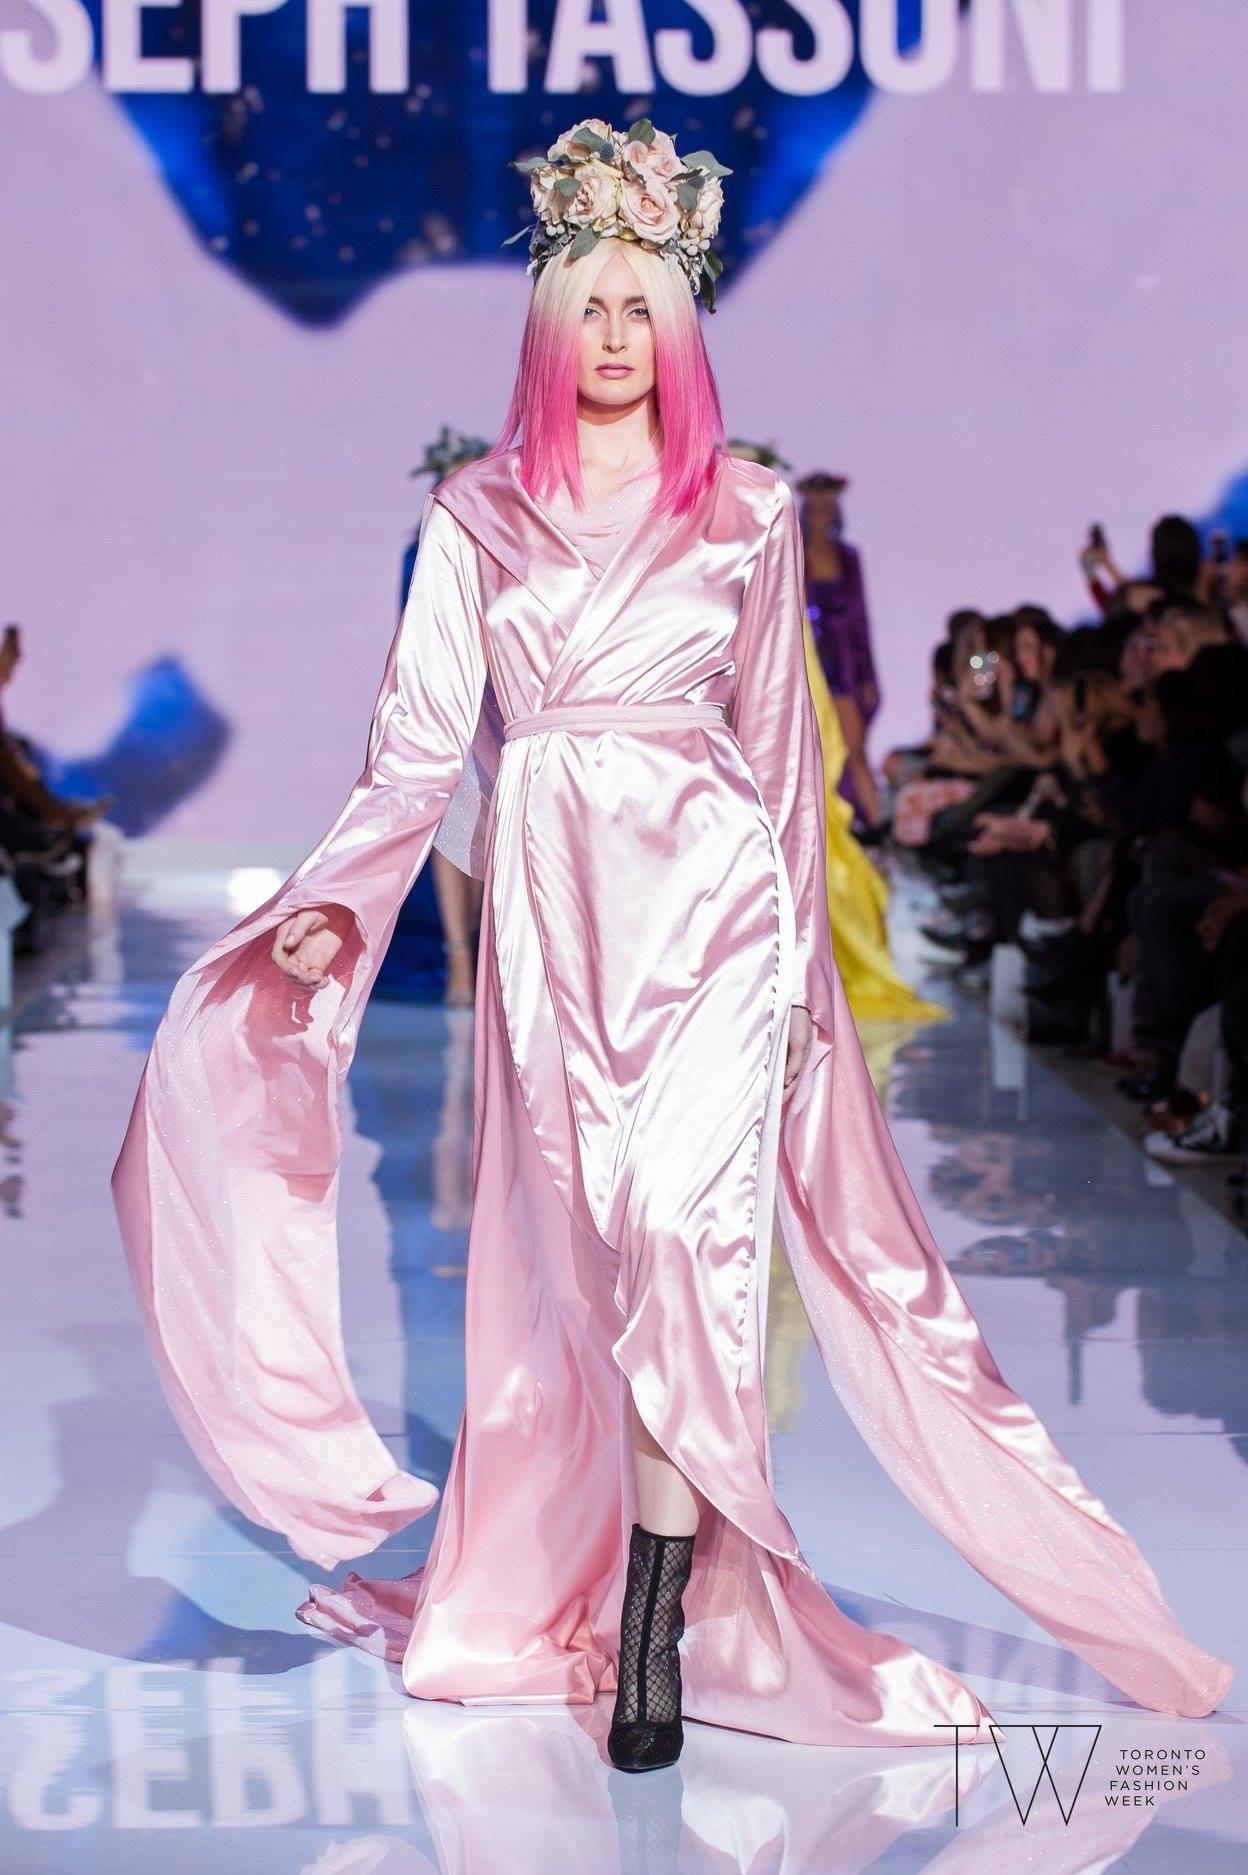 Tw Fw Toronto Women S Fashion Week Joseph Tassoni Oudalova Events Design